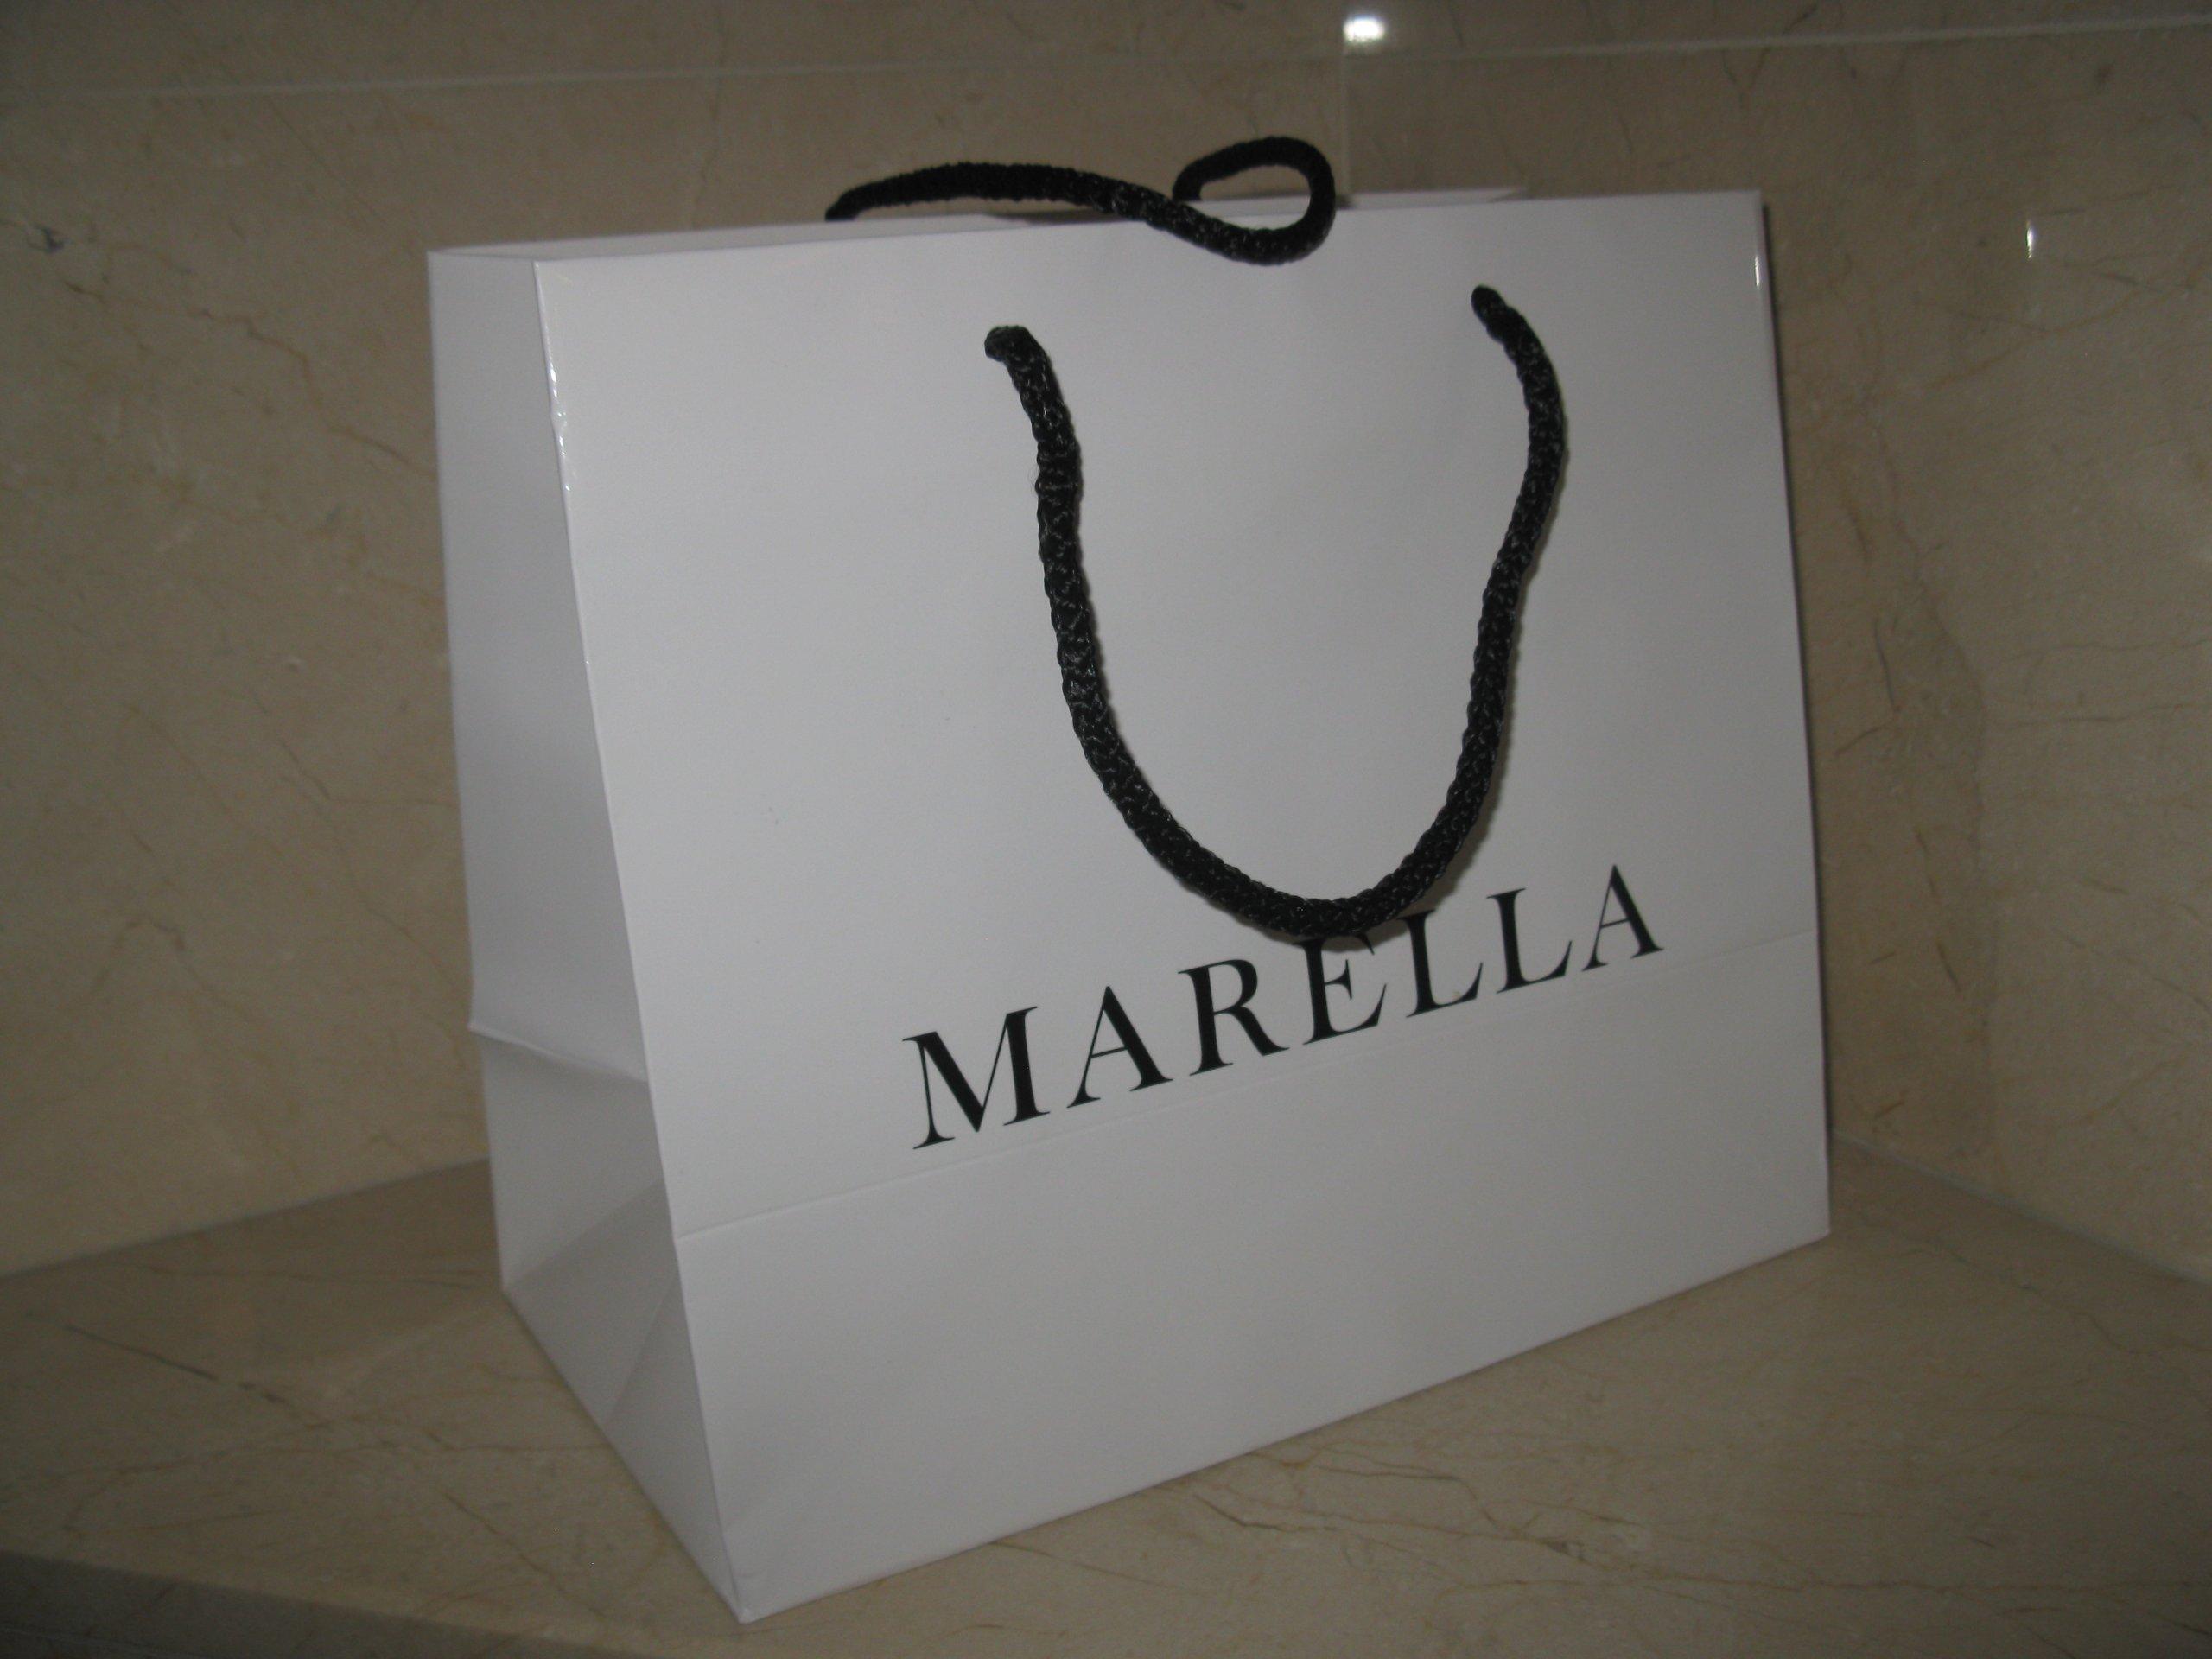 dd2b70a74c654 MARELLA MAX MARA torba papierowa M NOWA - 7291528738 - oficjalne ...